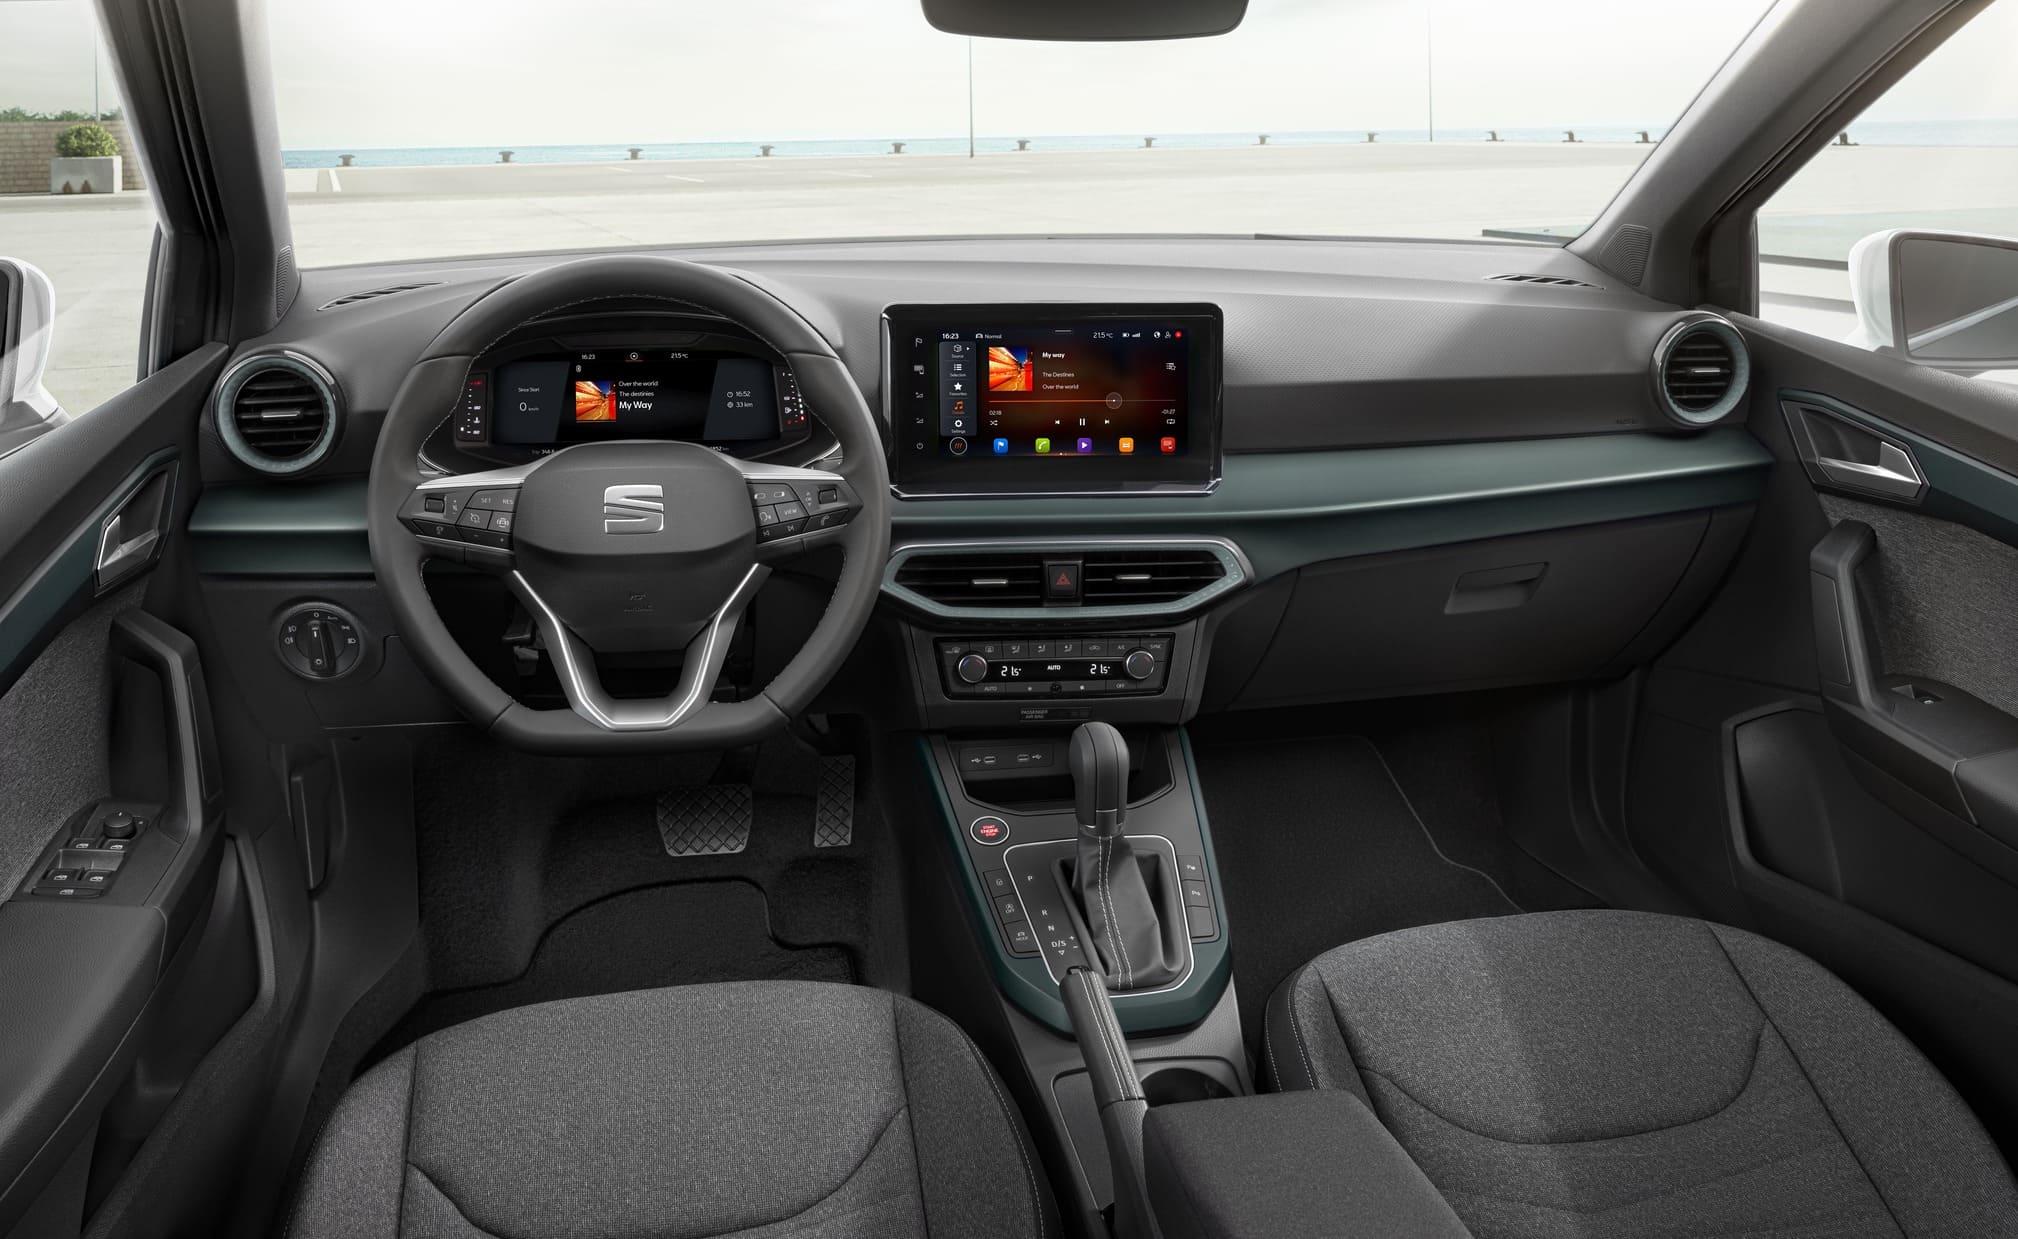 SEAT-Arona-2021-interior